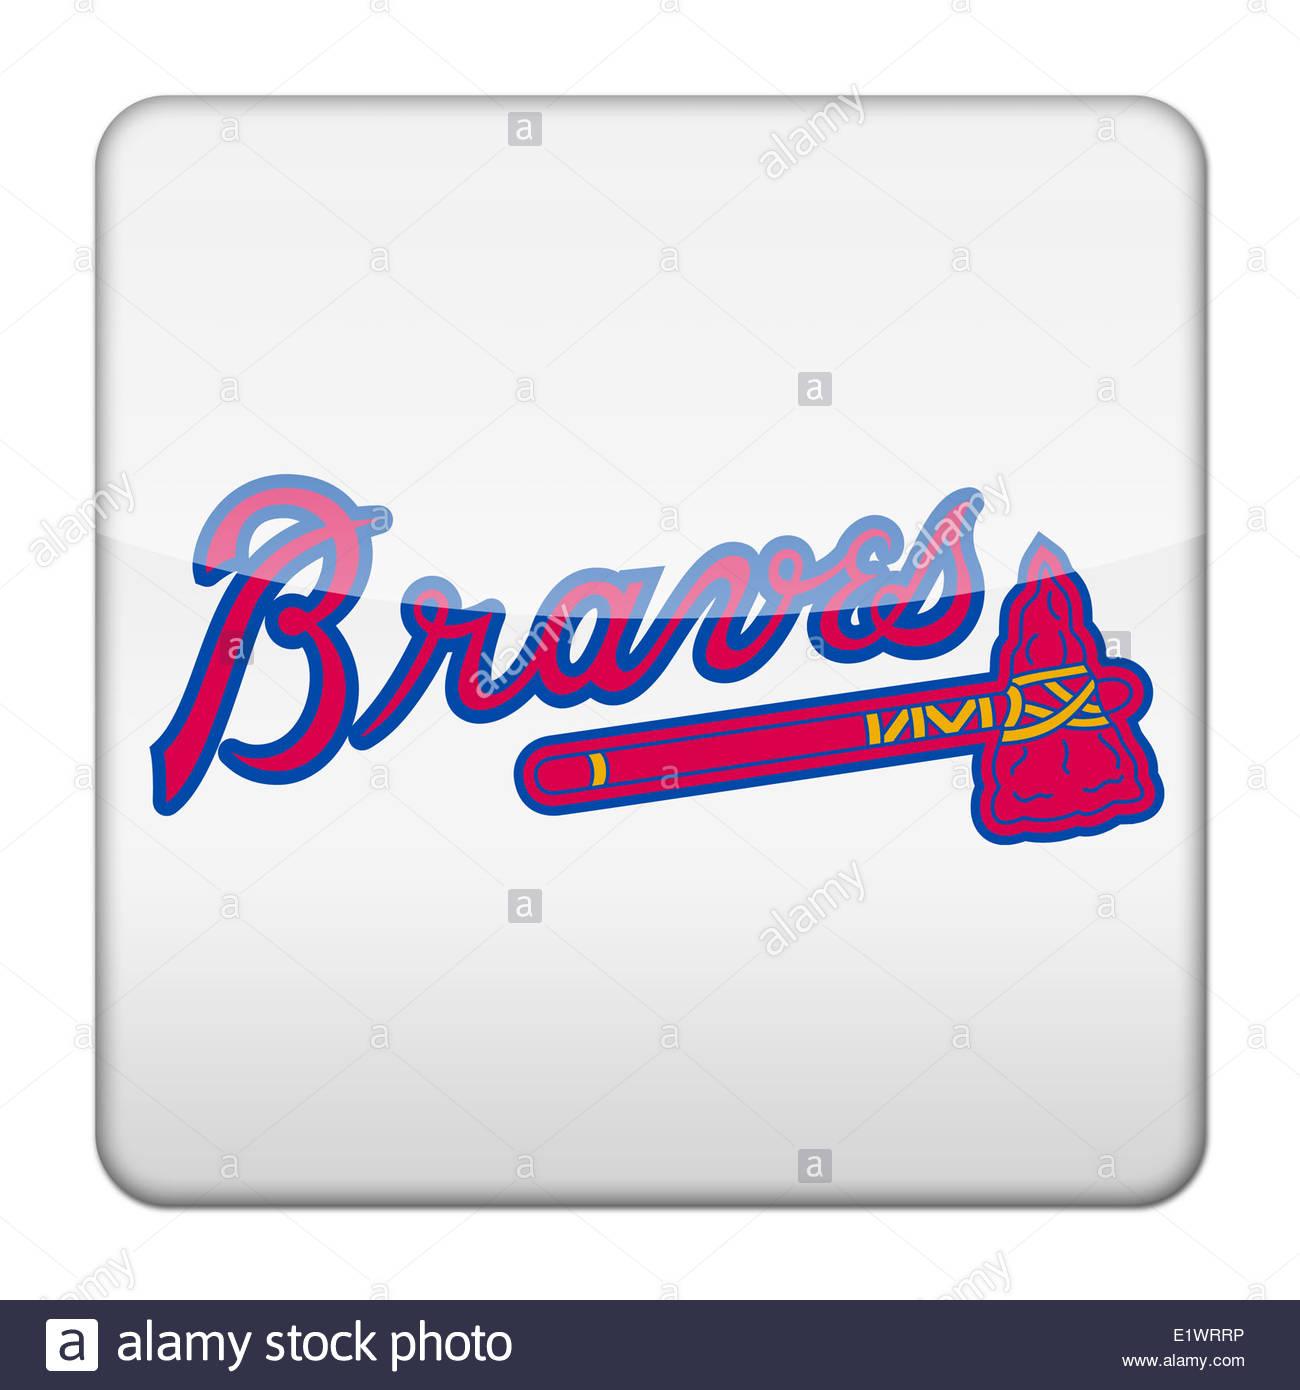 1300x1390 Atlanta Braves Icon Logo Isolated App Button Stock Photo, Royalty